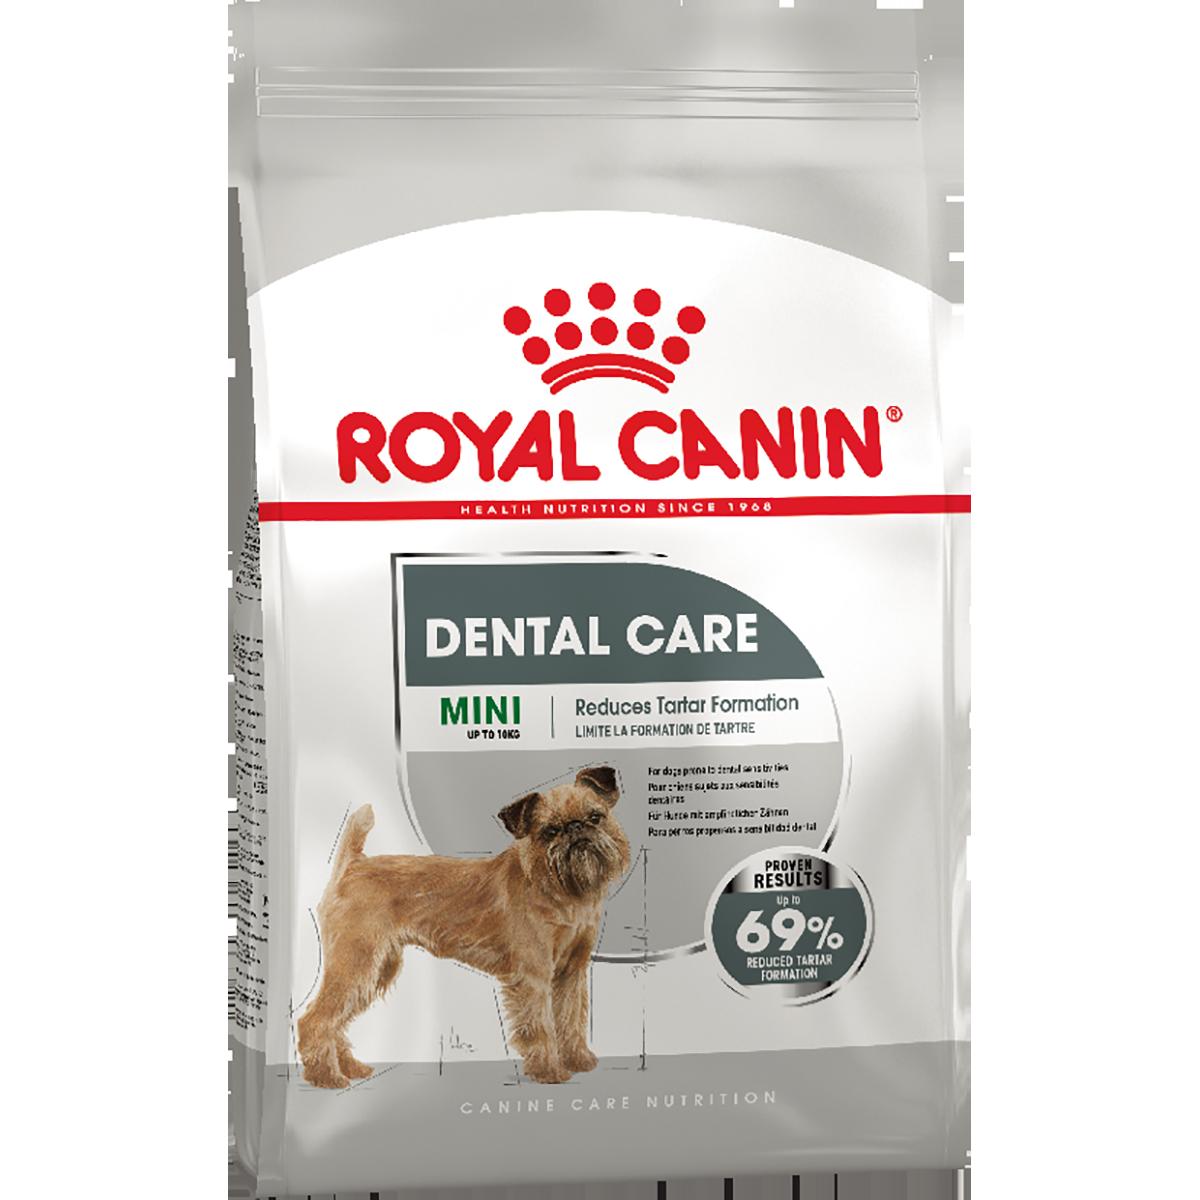 Сухой корм для собак Роял Канин Royal Canin Dental Care mini, 1 кг